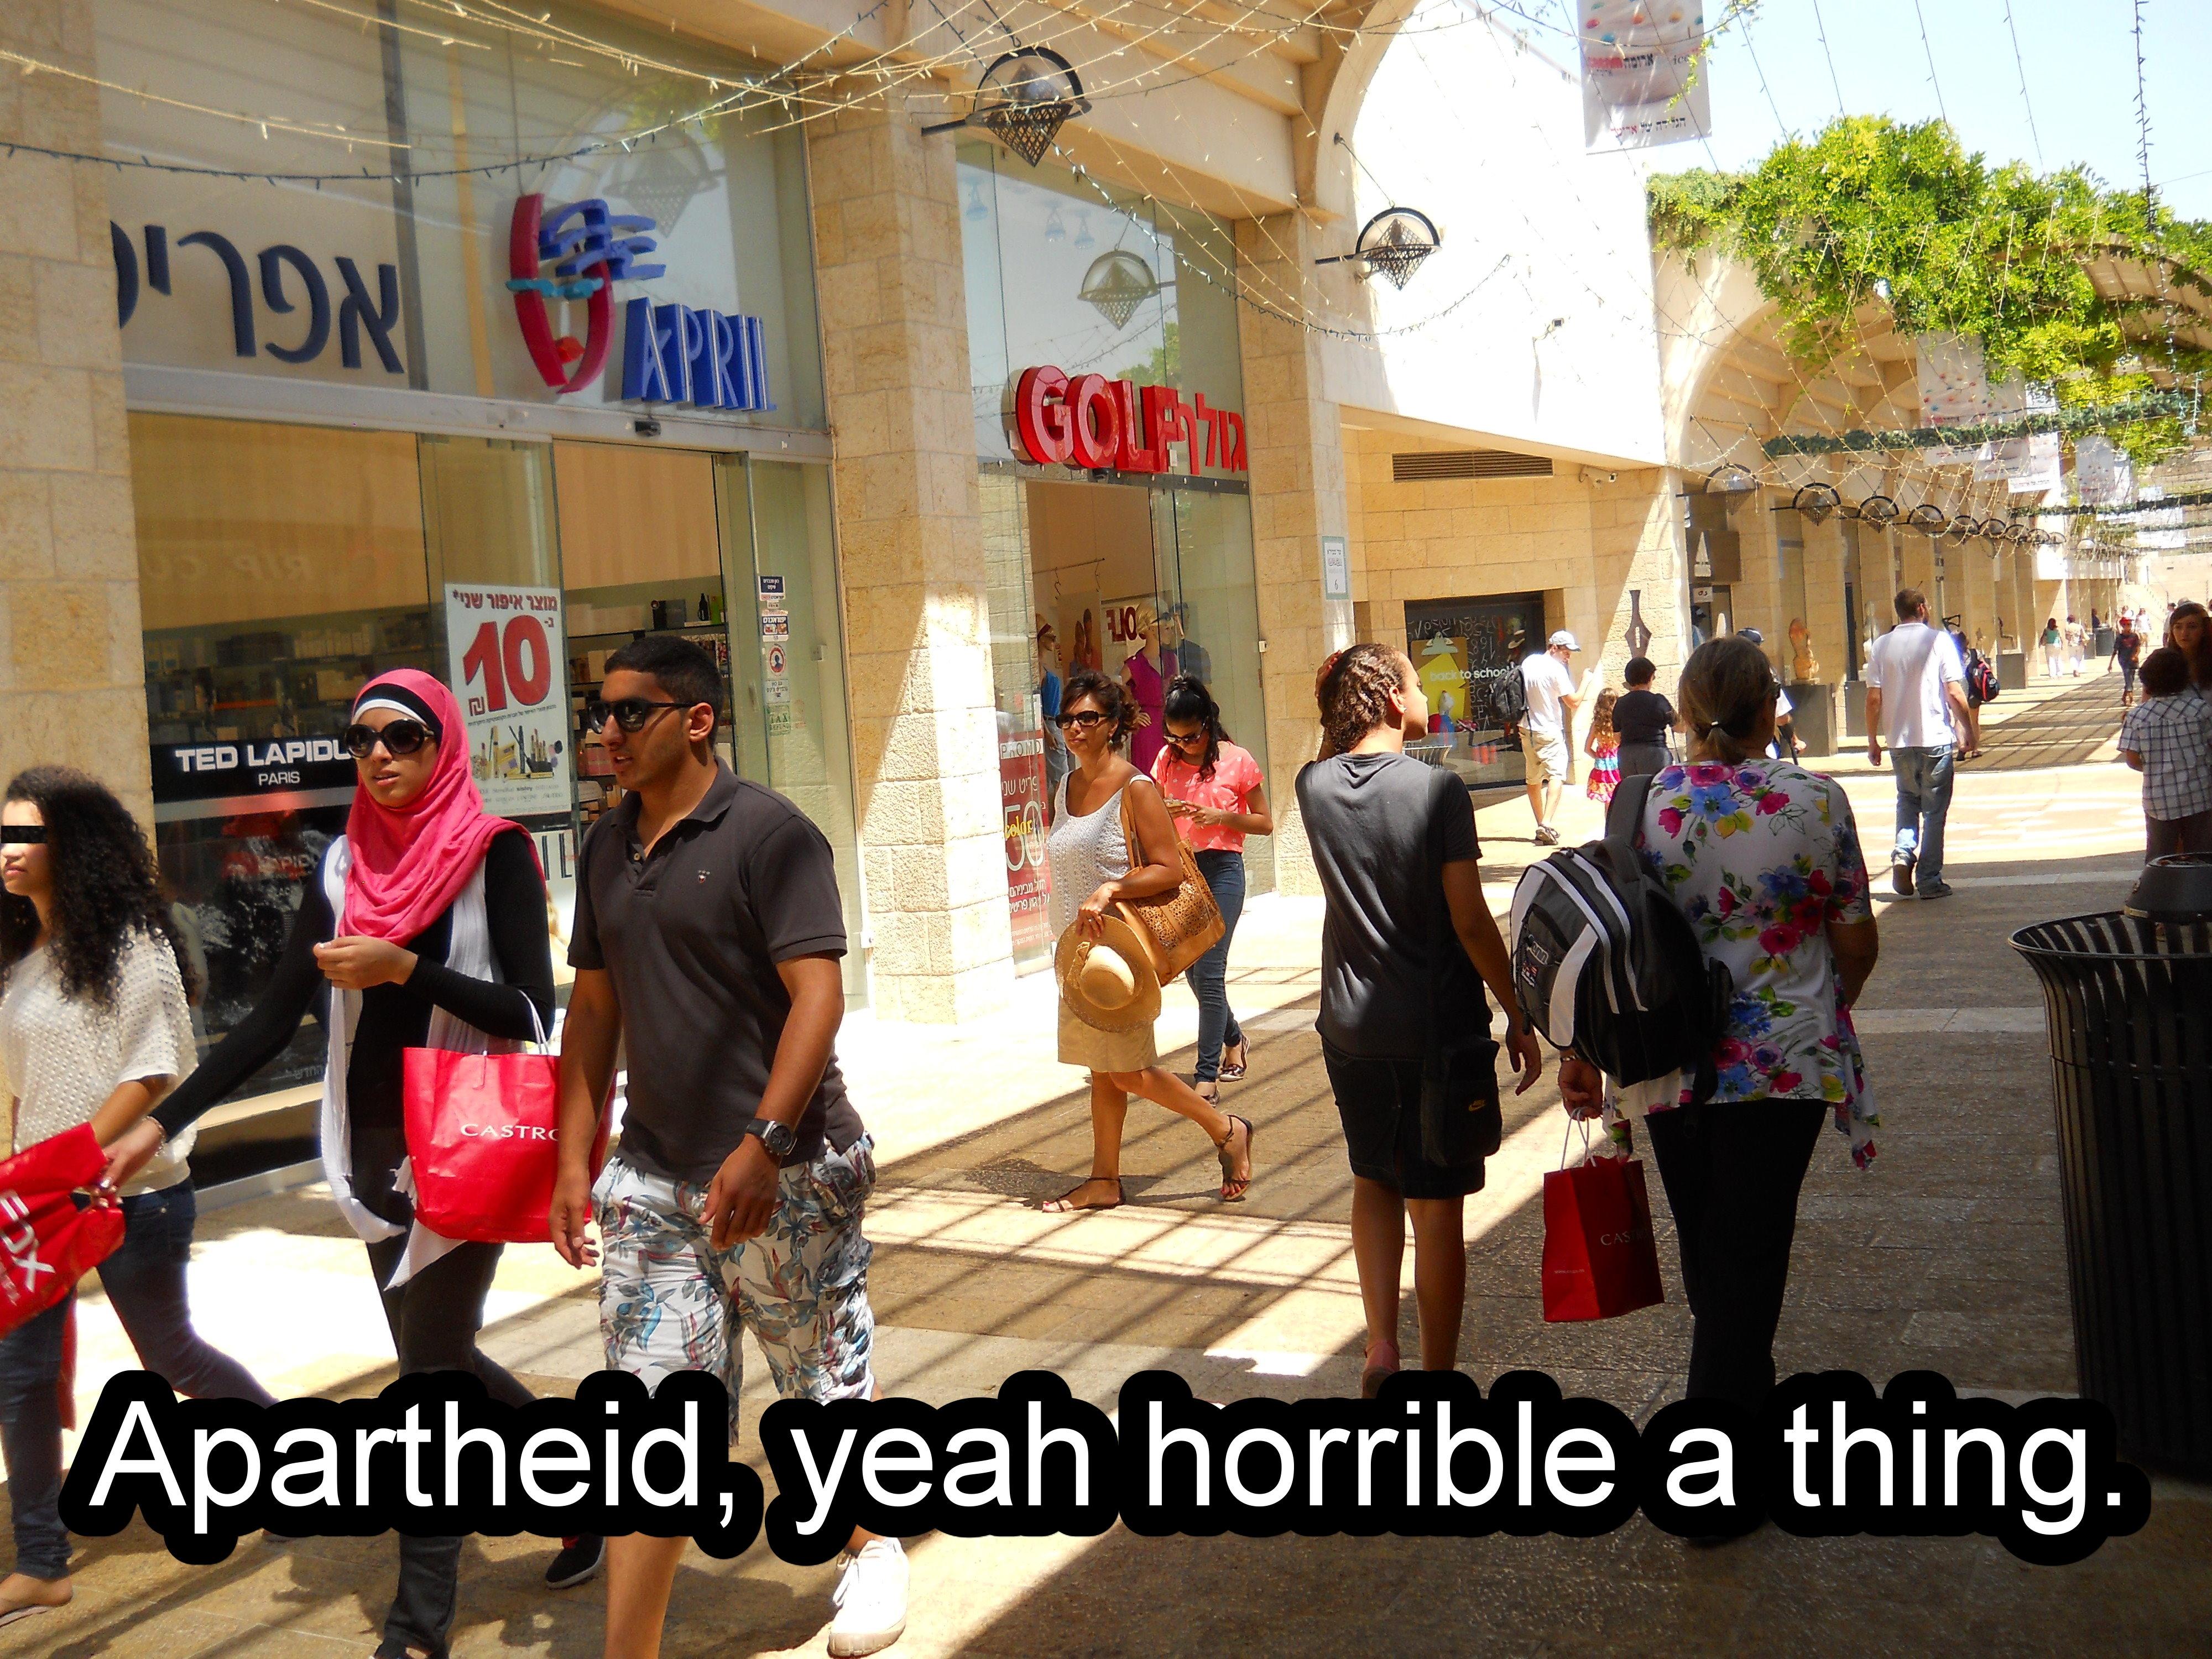 Apartheid12